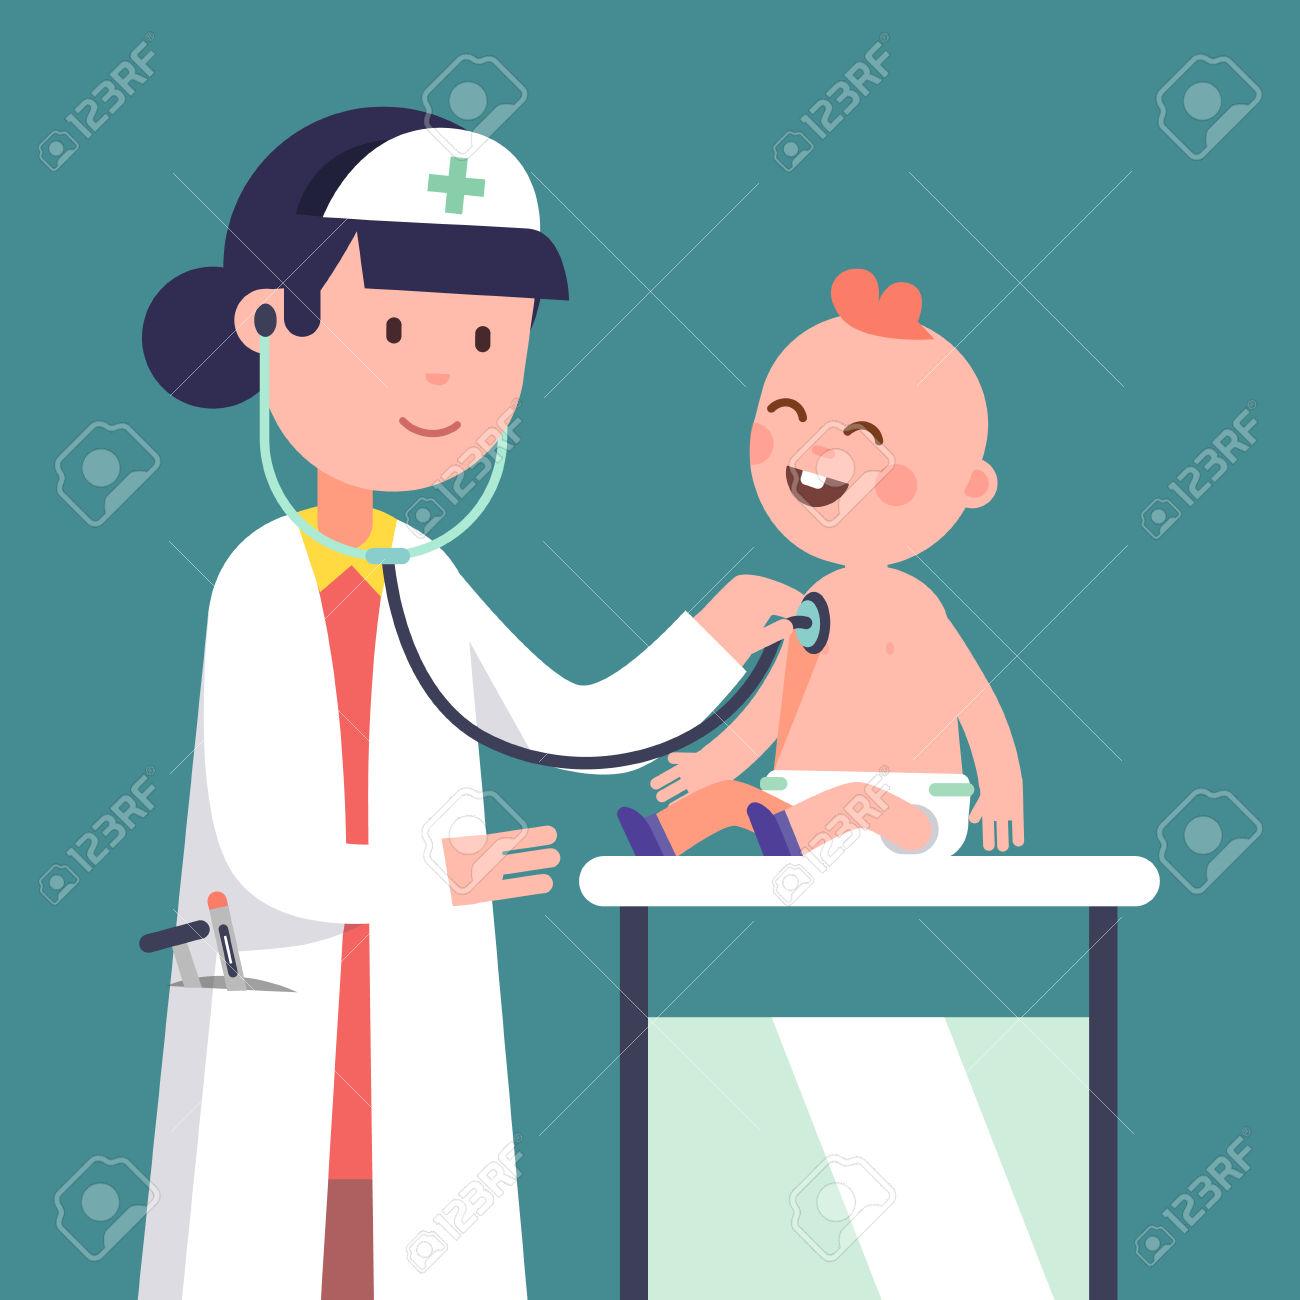 Pediatrician Doctor Woman Doing Medical Examination Of Baby Boy.